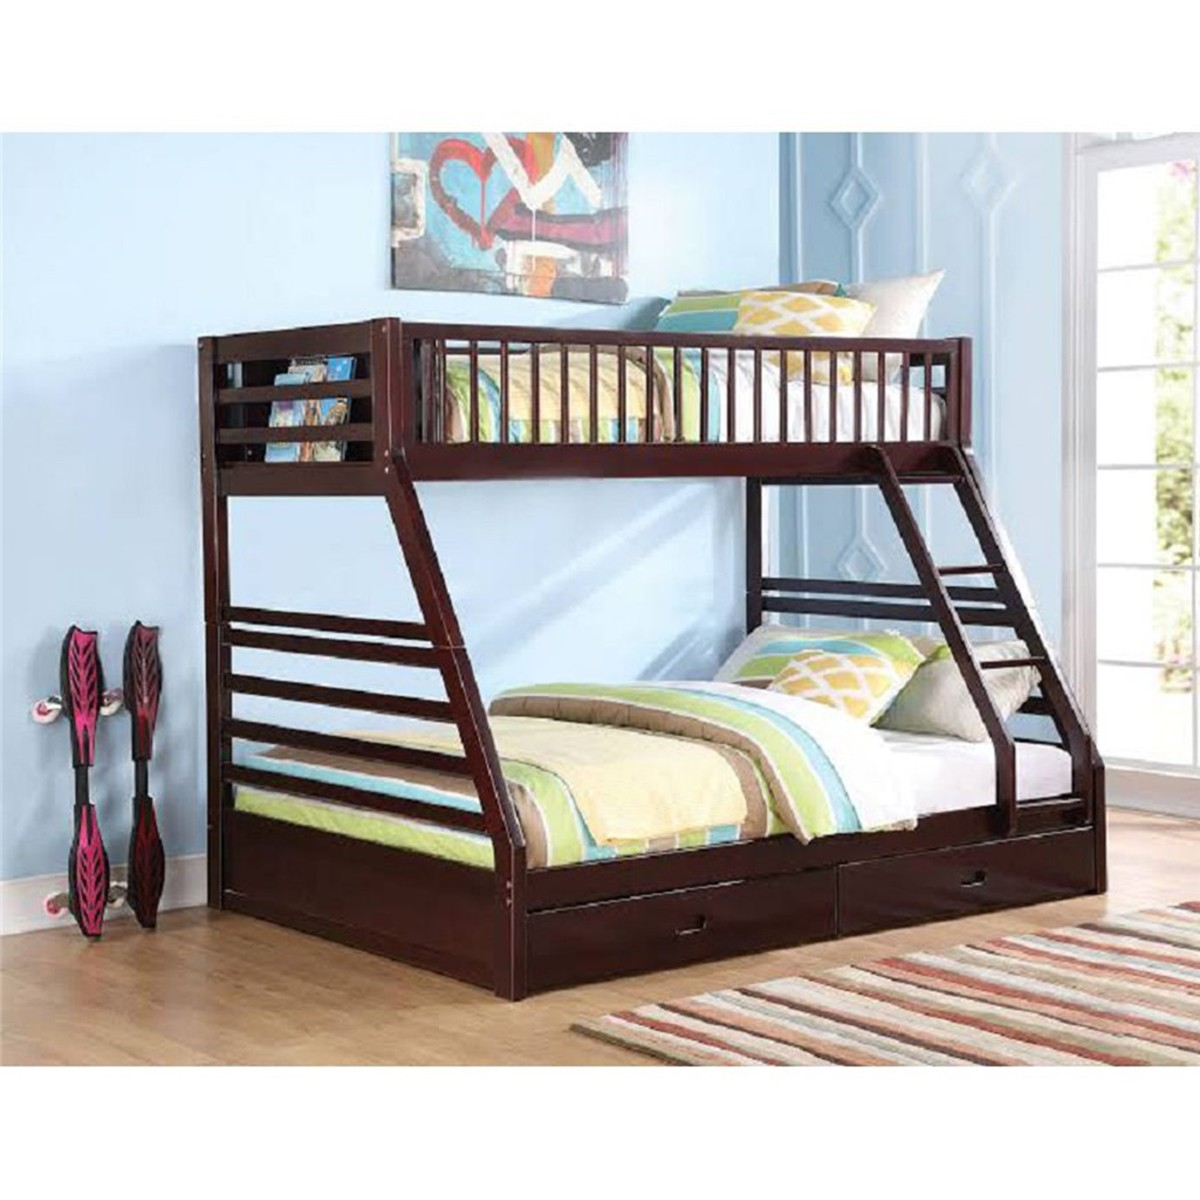 Modernluxe Twin Xl Over Queen Bunk Bed Built In Ladder And Storage Drawers Walmart Com Walmart Com